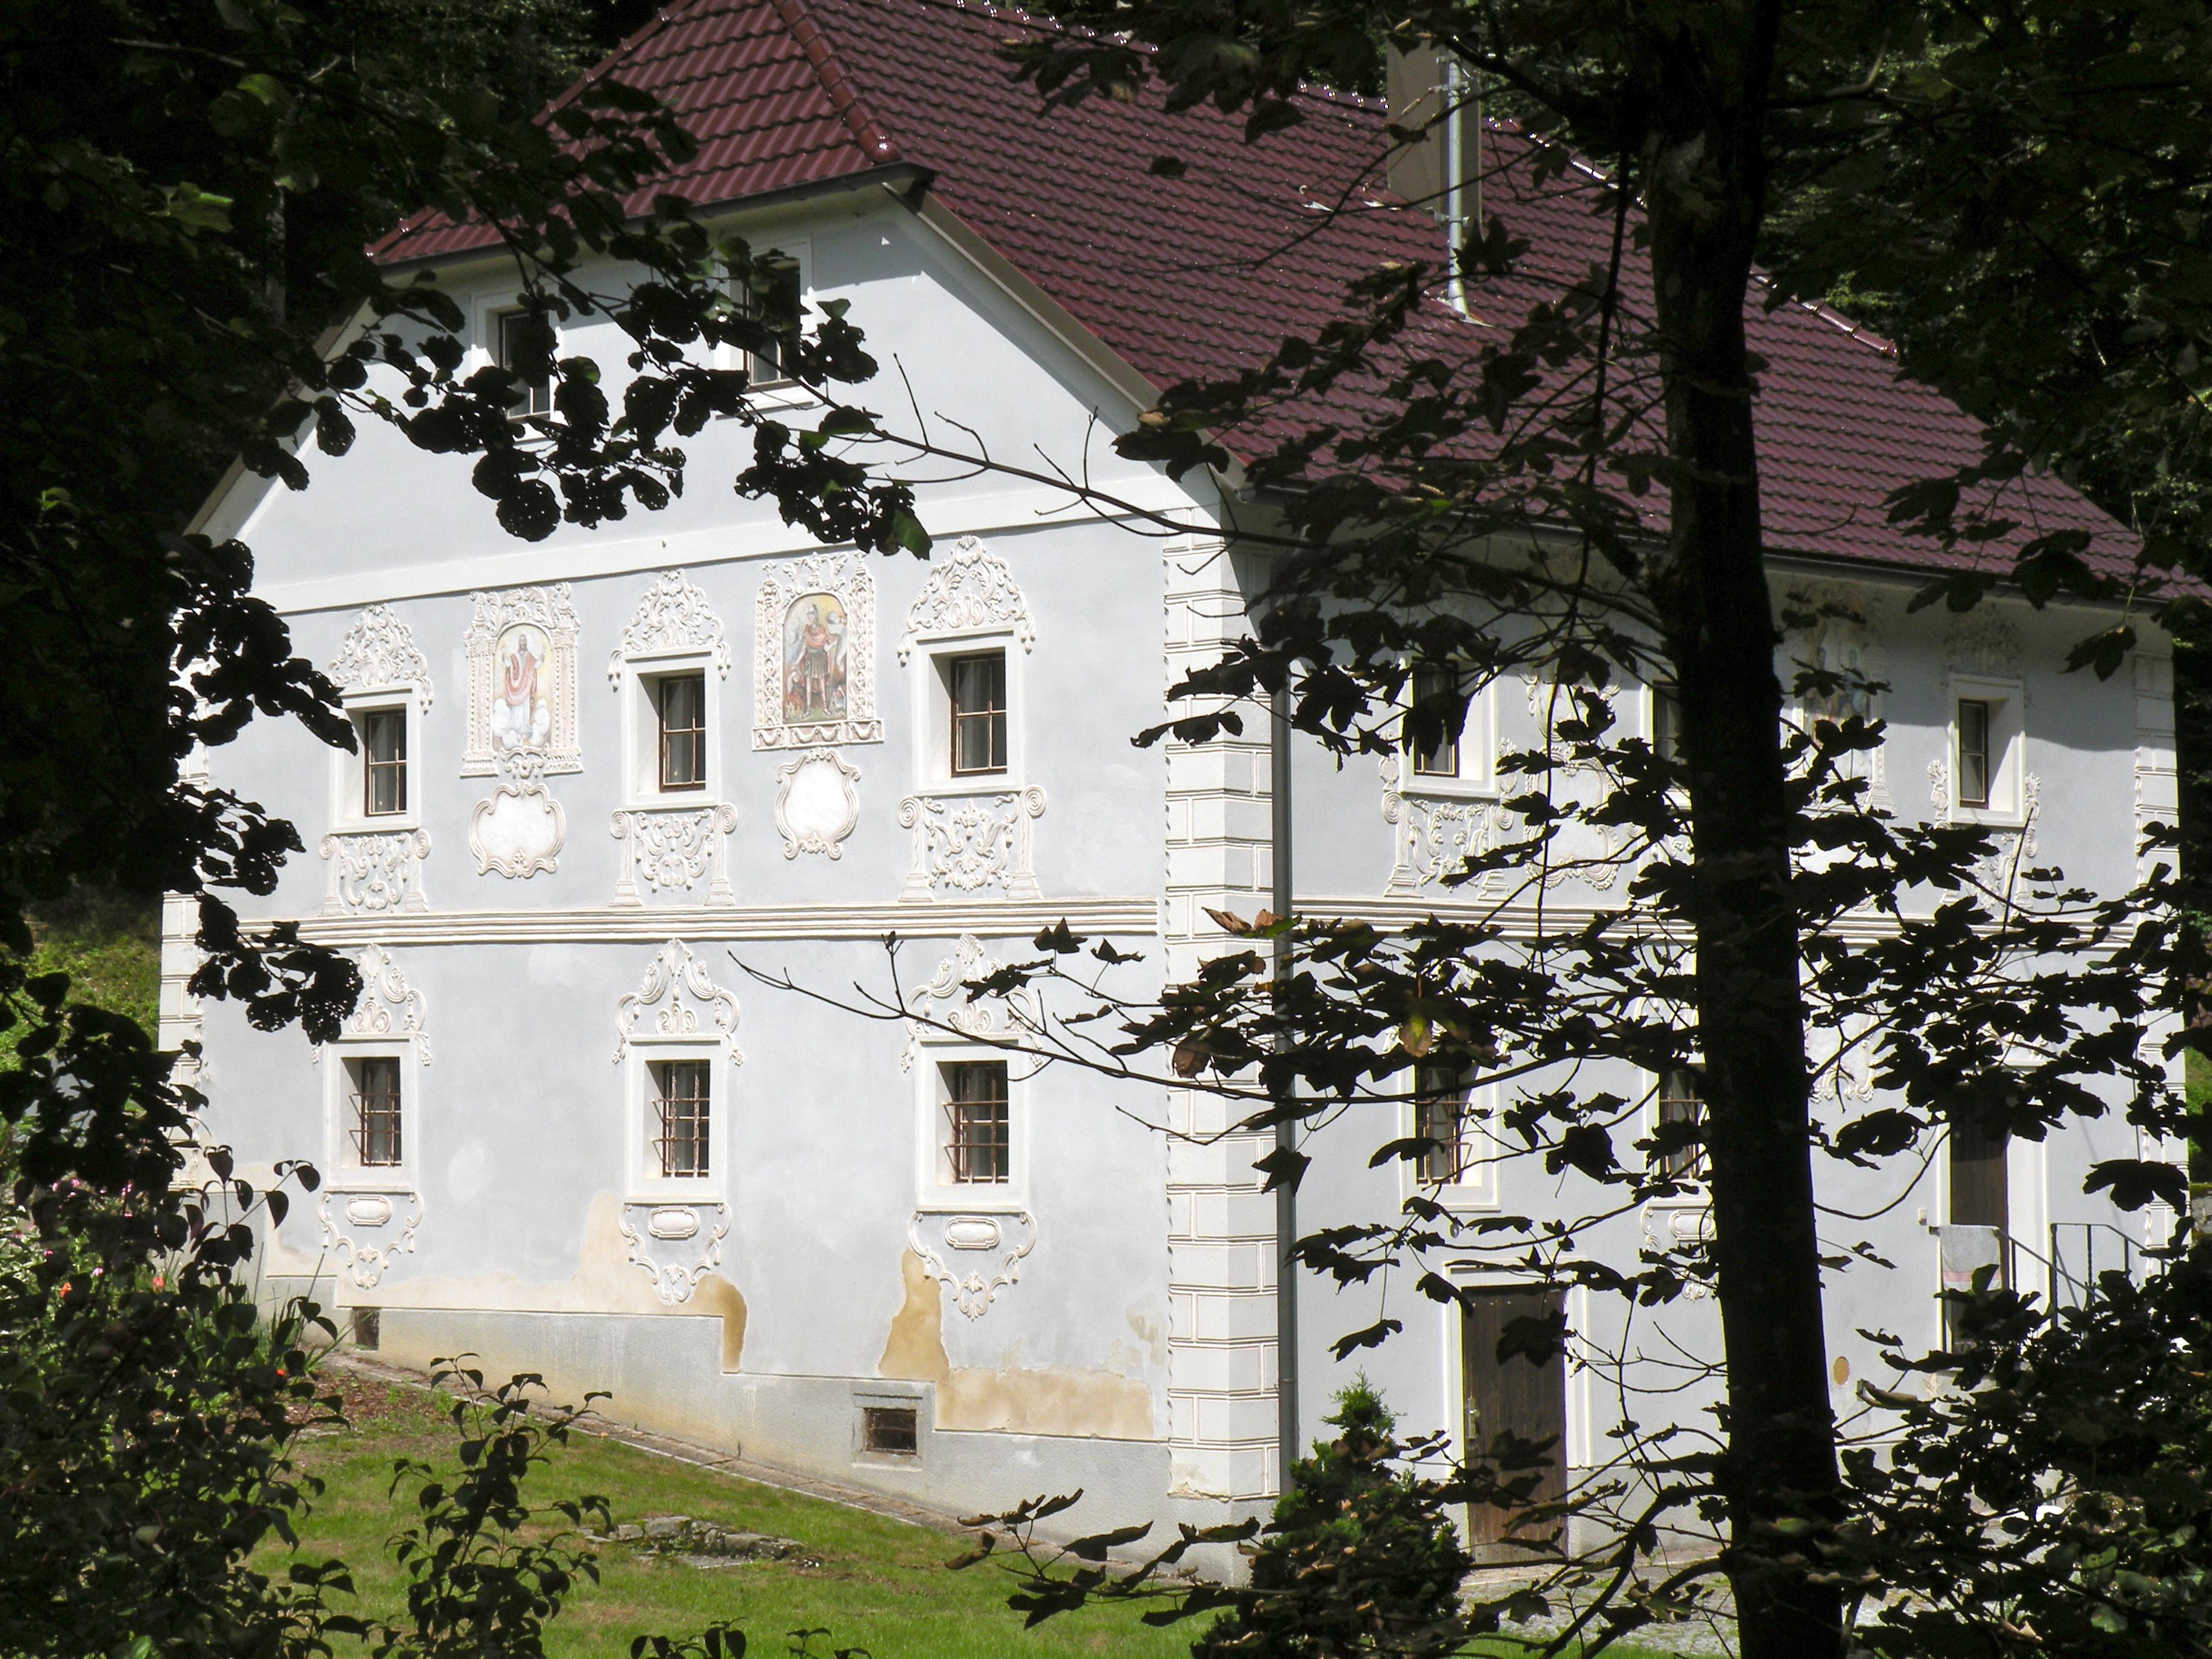 Bad Mhllacken - Pauschalangebote - CURHAUS